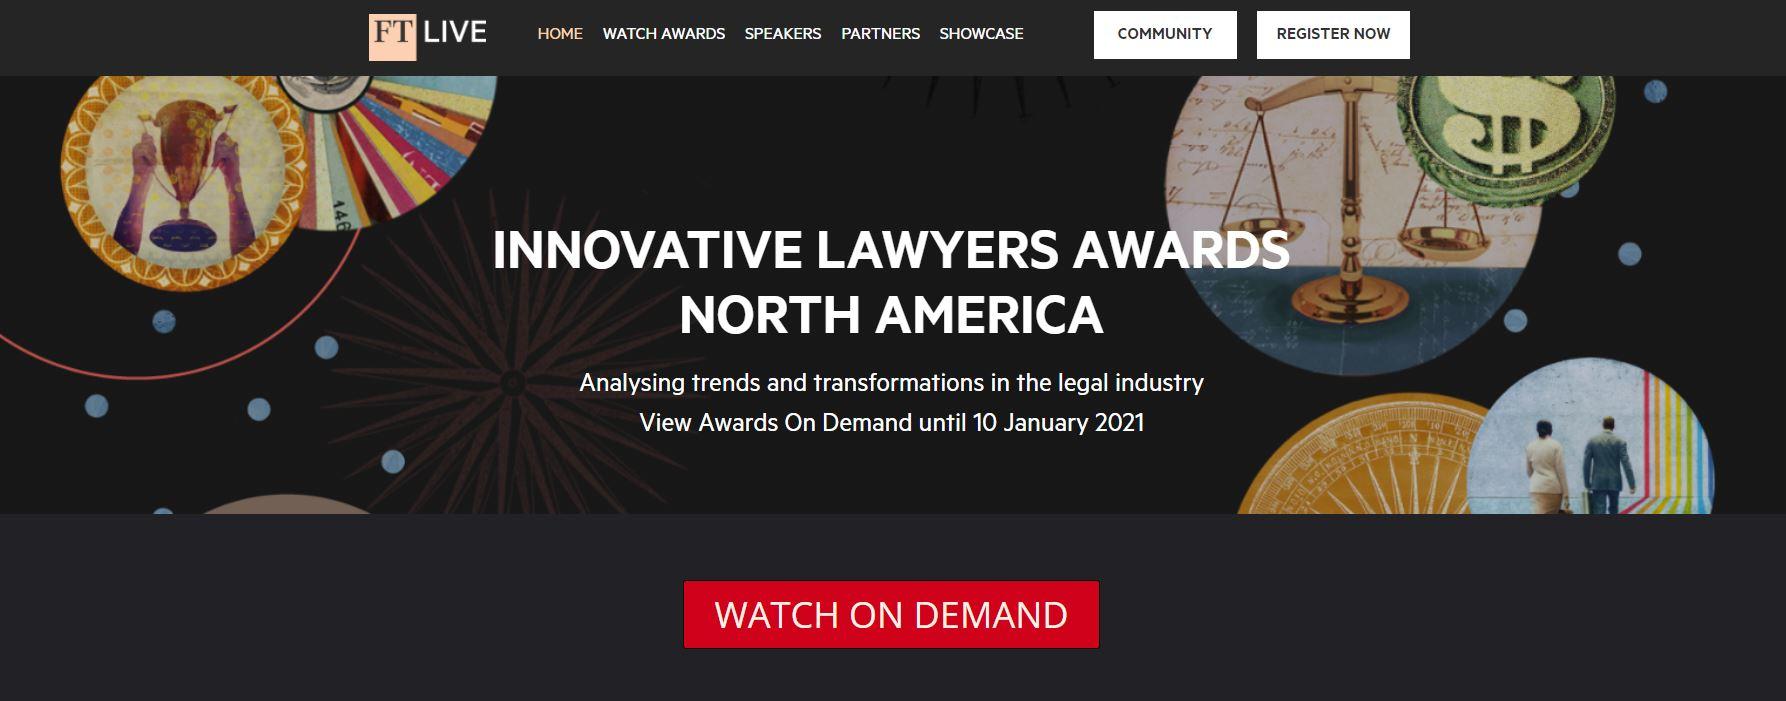 lawyersnorthamerica.live.ft.com/home